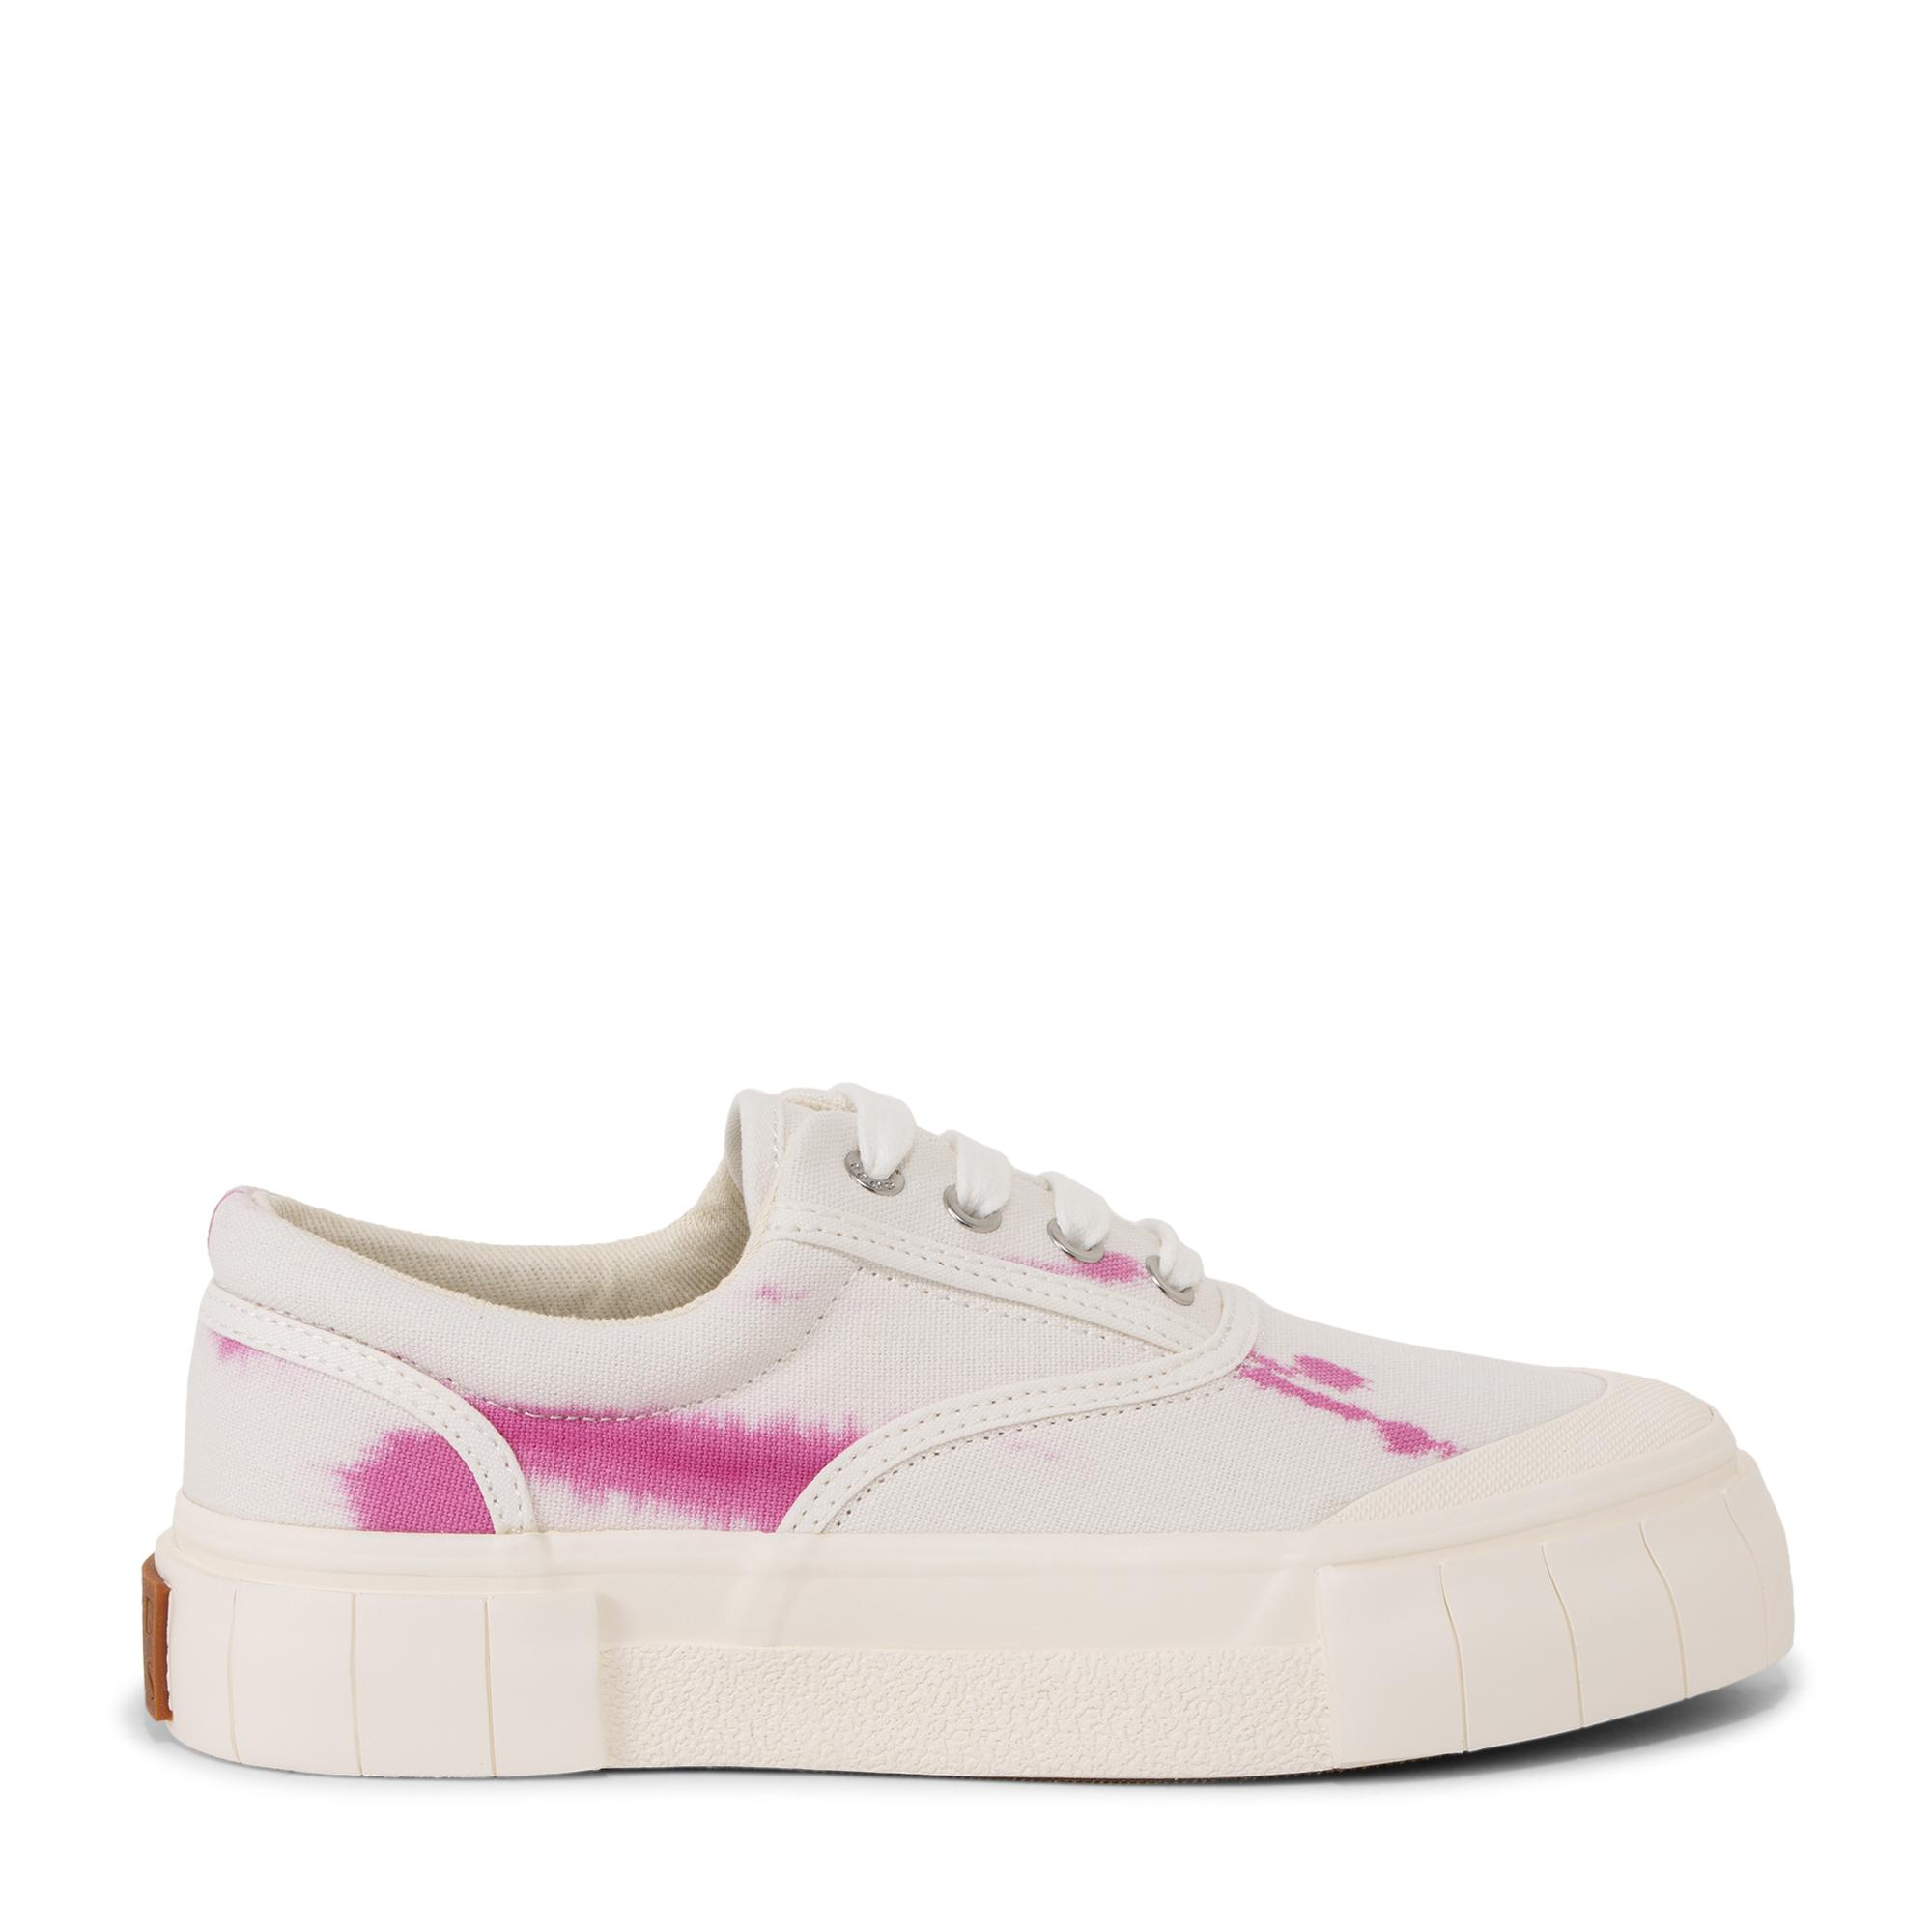 Opal ombre sneakers